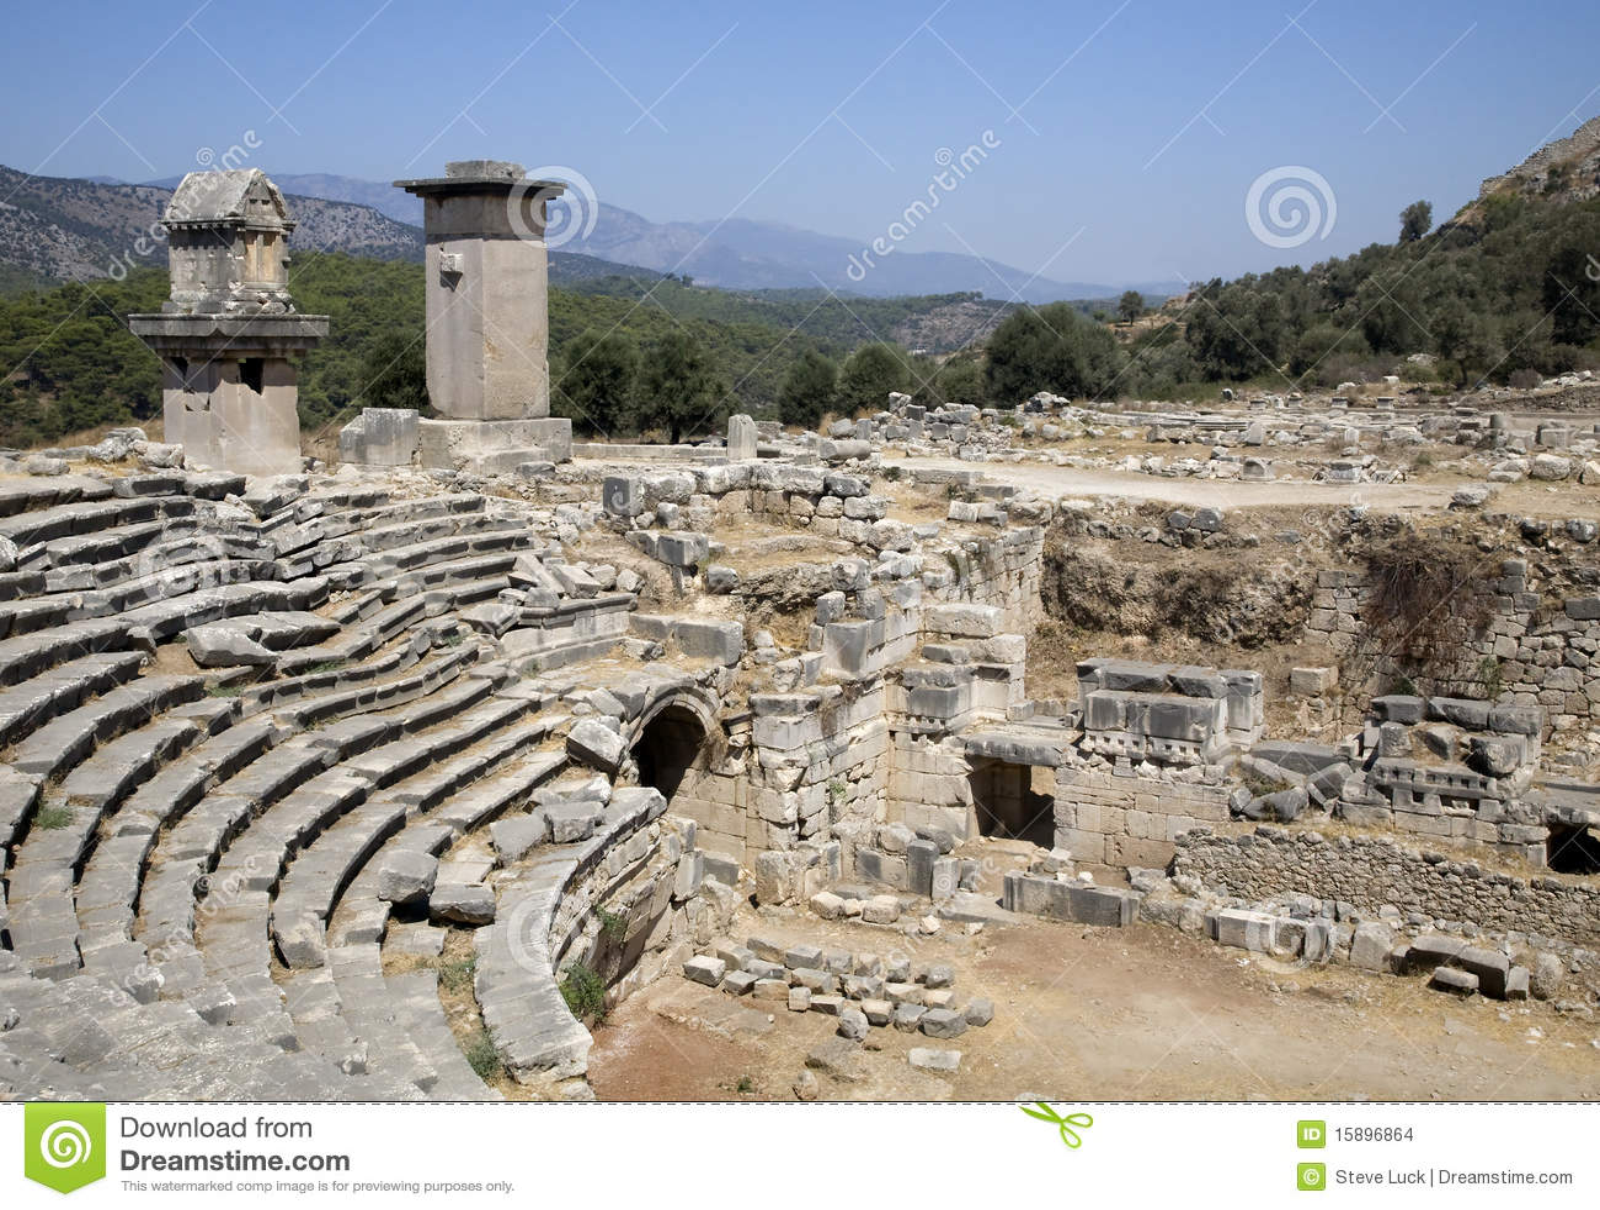 Amphitheatre romano em Xanthos, Turquia